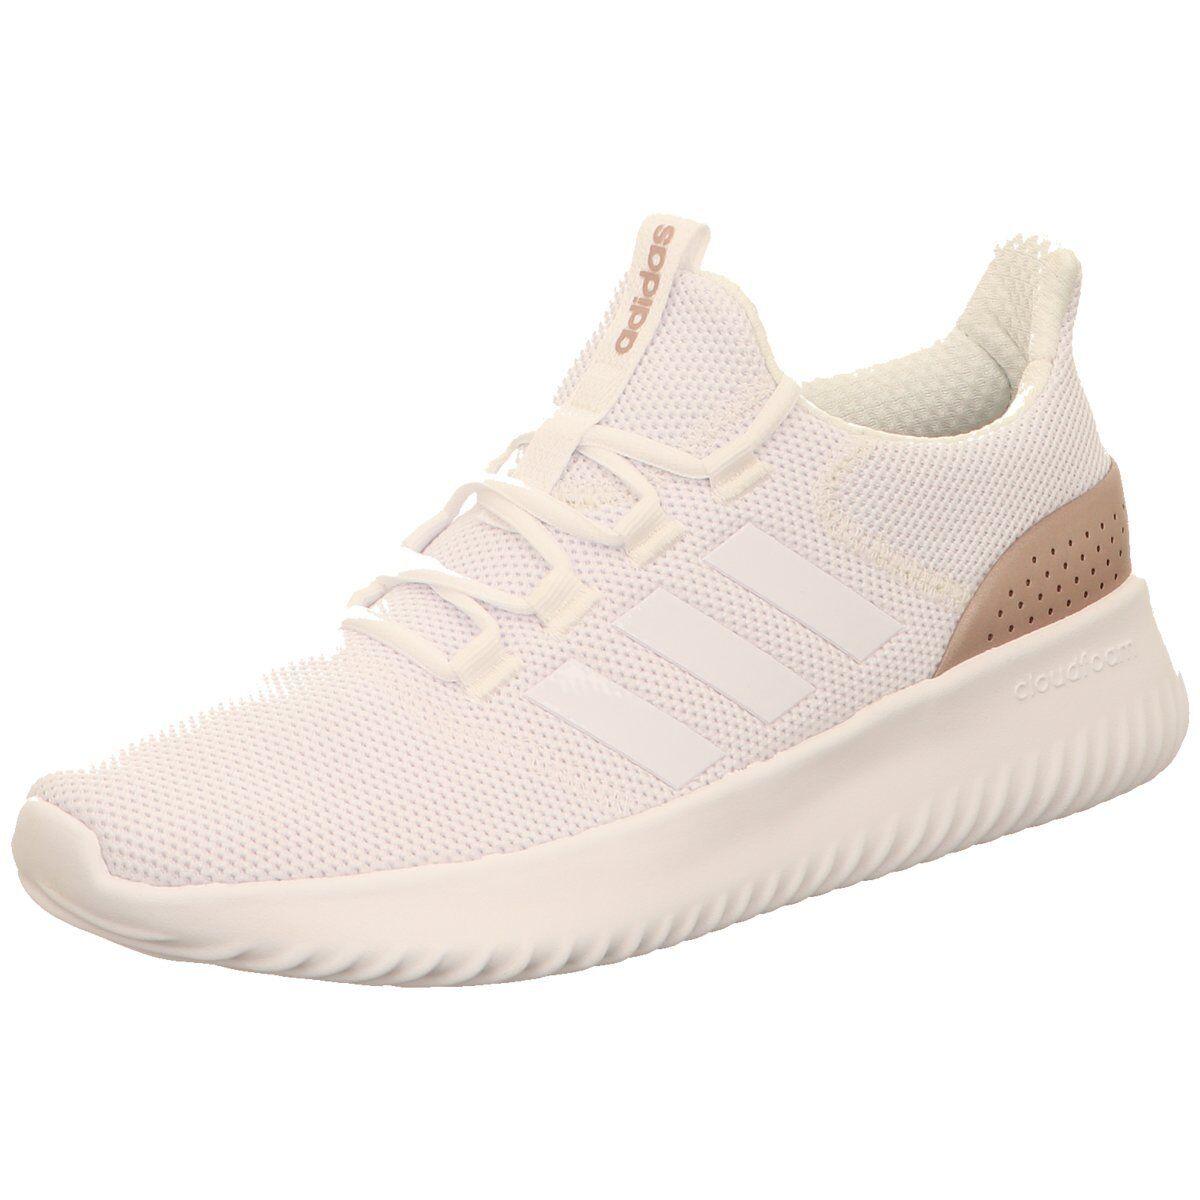 NEU adidas Core Damen Sneaker CLOUDFOAM ULTI Wei  DB1791/000 weiß 433768